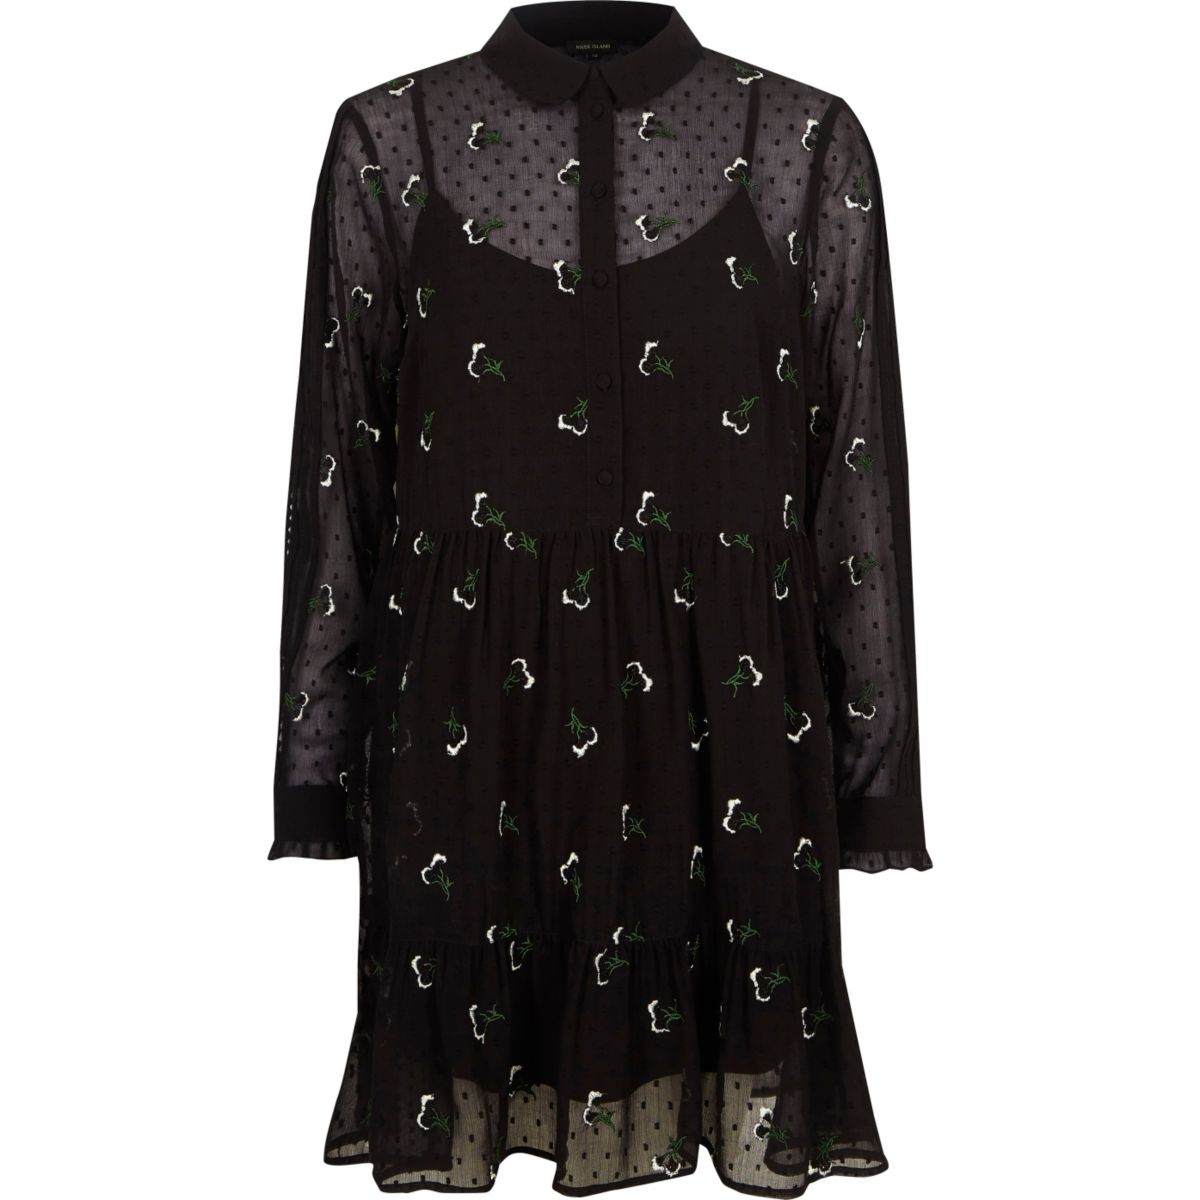 Black dobby ruffle hem floral dress